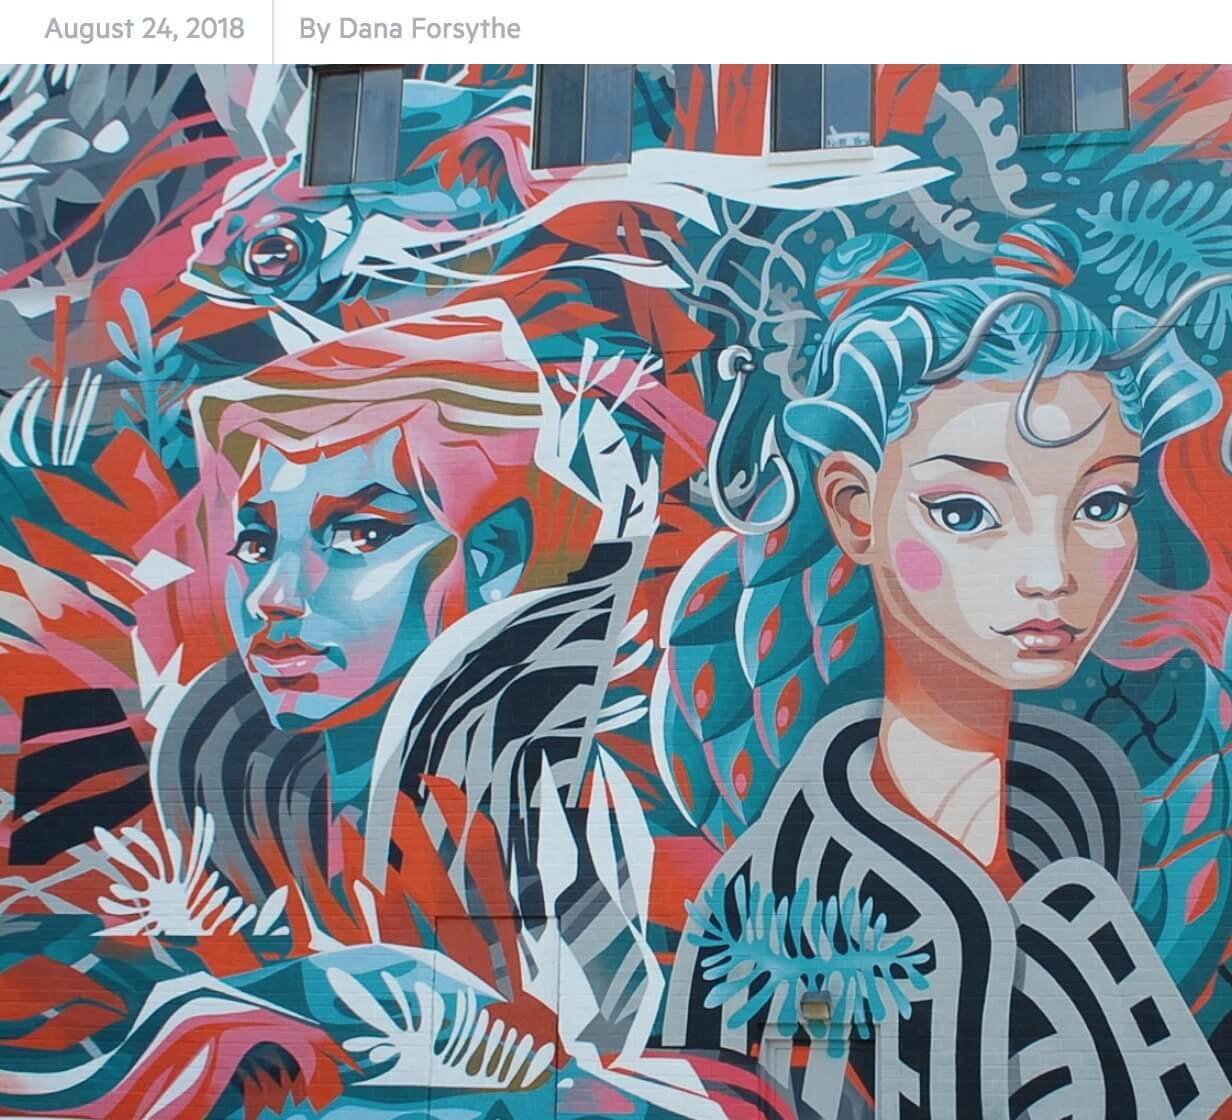 Our_Favorite_Street_Art_From_Lynn_s_Beyond_Walls_Mural_Festival___The_ARTery.jpg